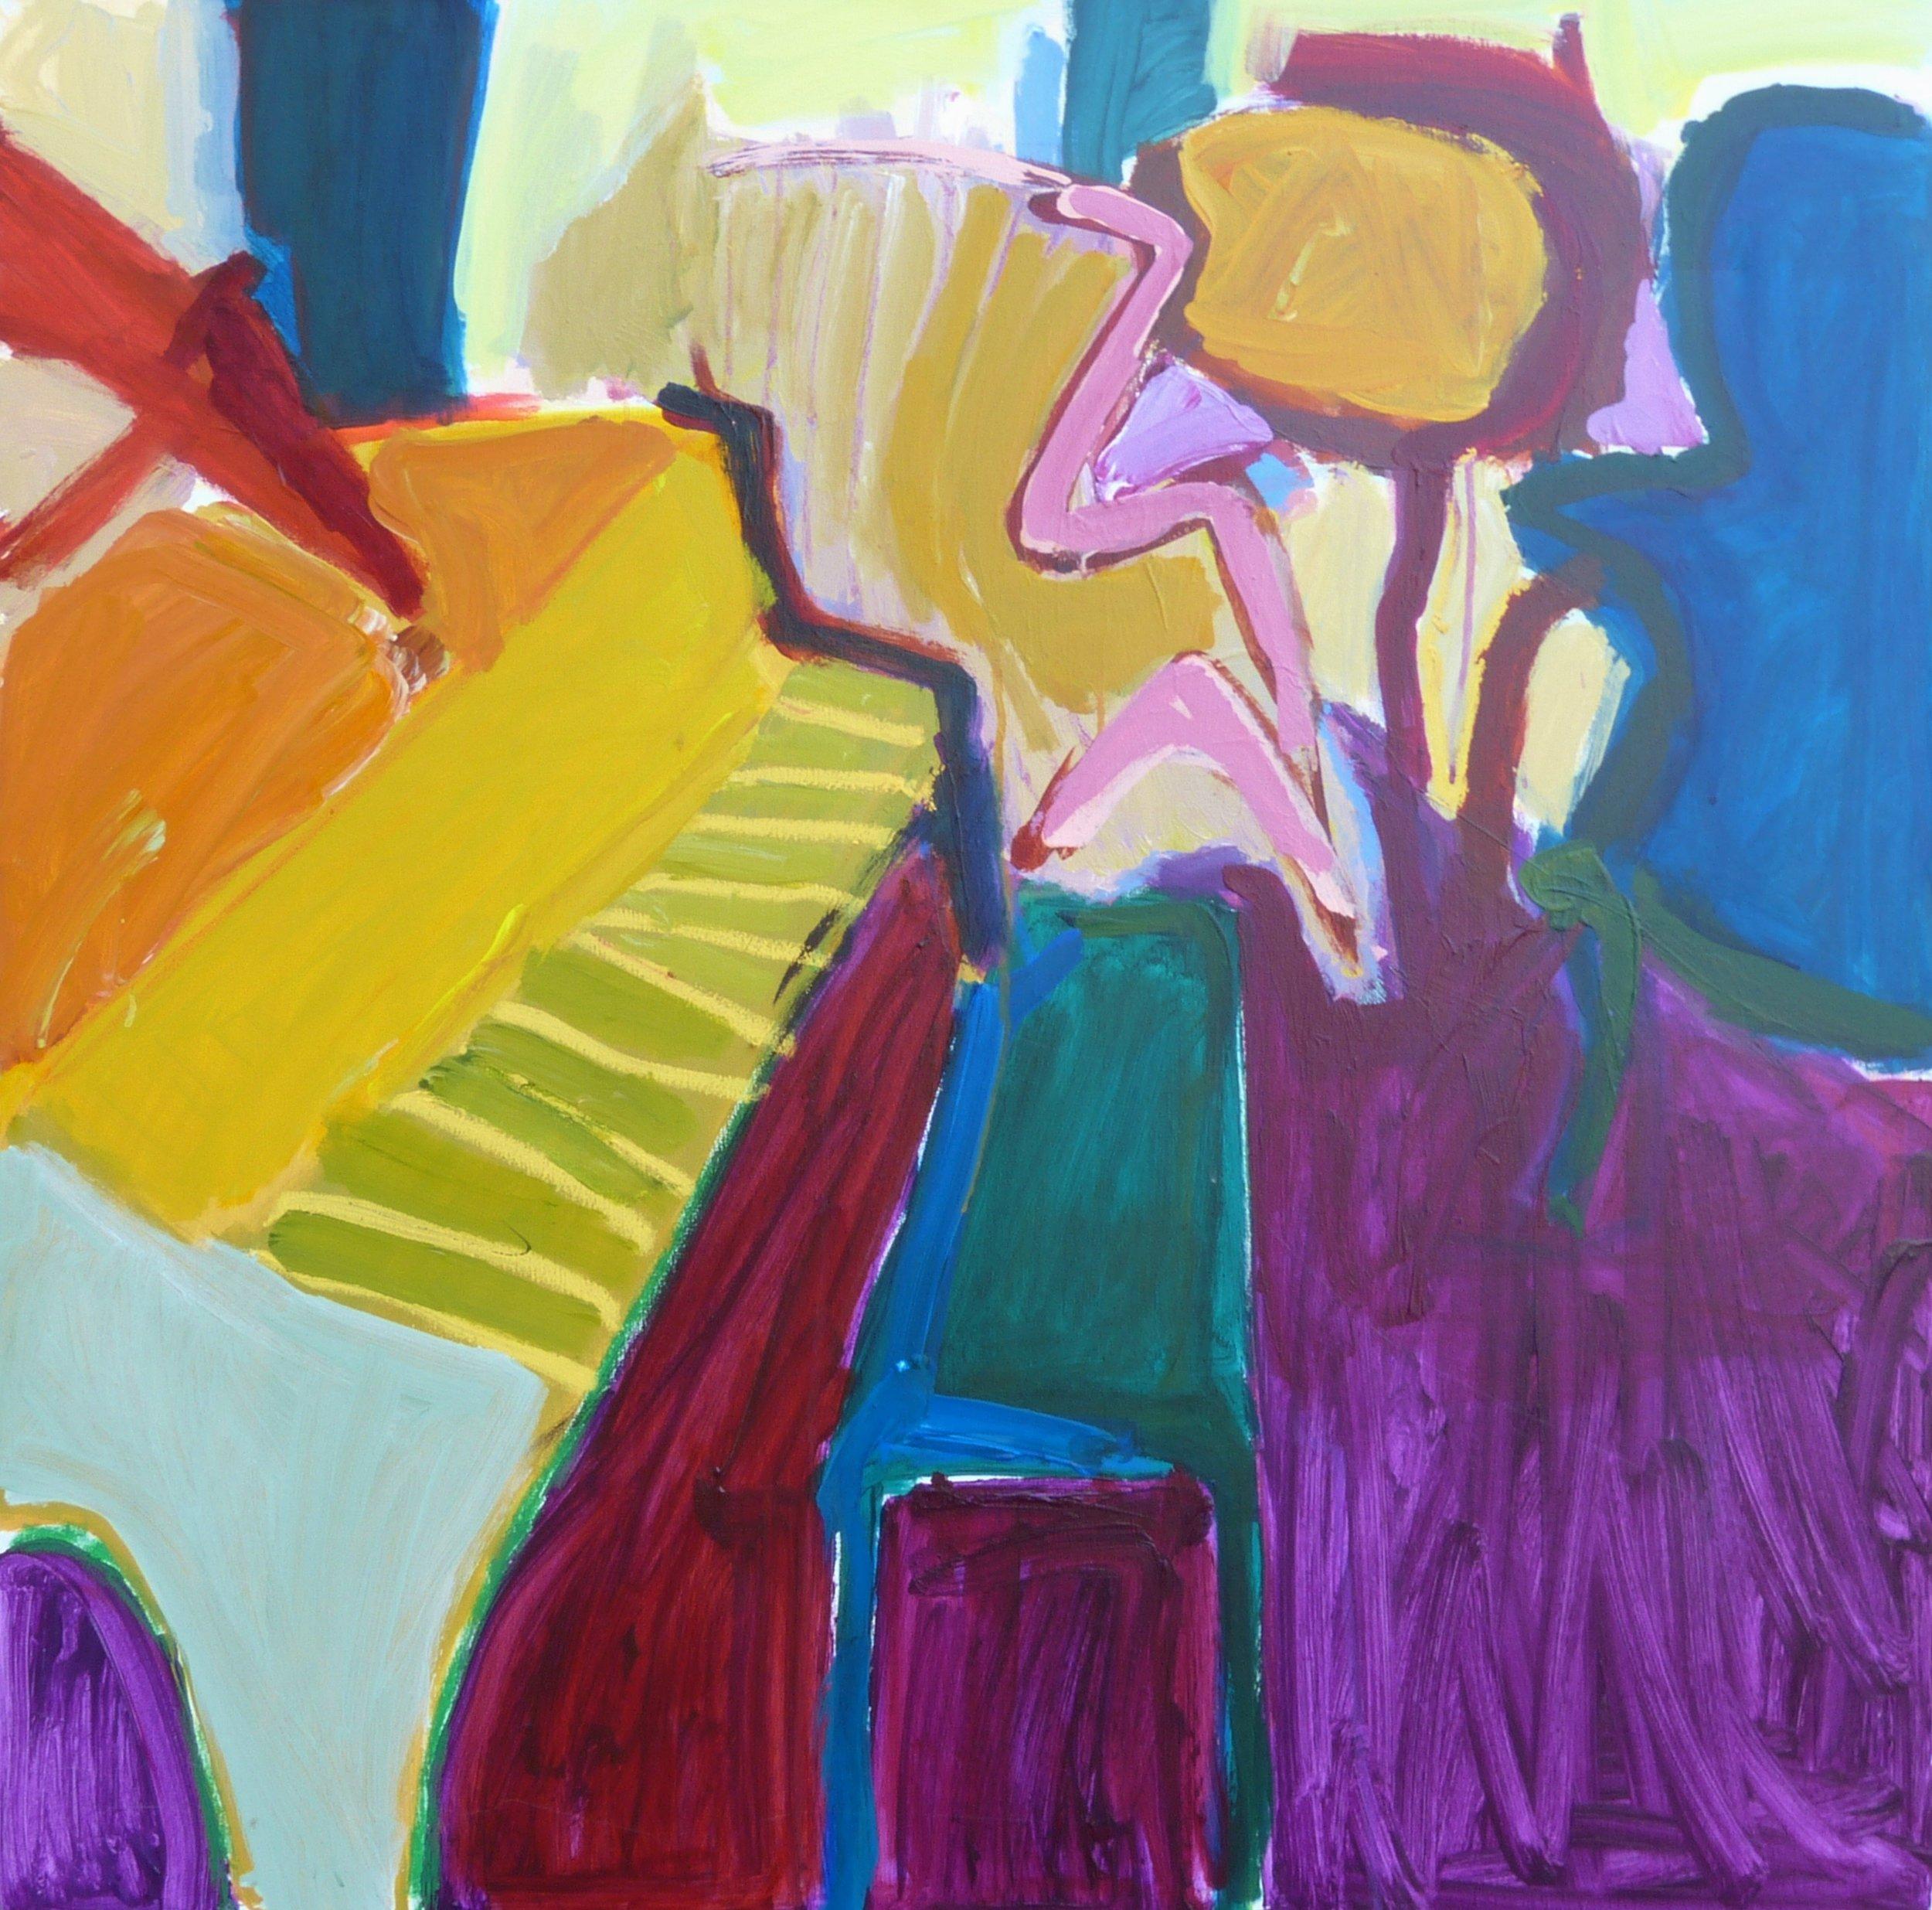 Linda Bankerd_Interior with Piano_2016_Acrylic on canvas_36_ x 36__$1050.jpg